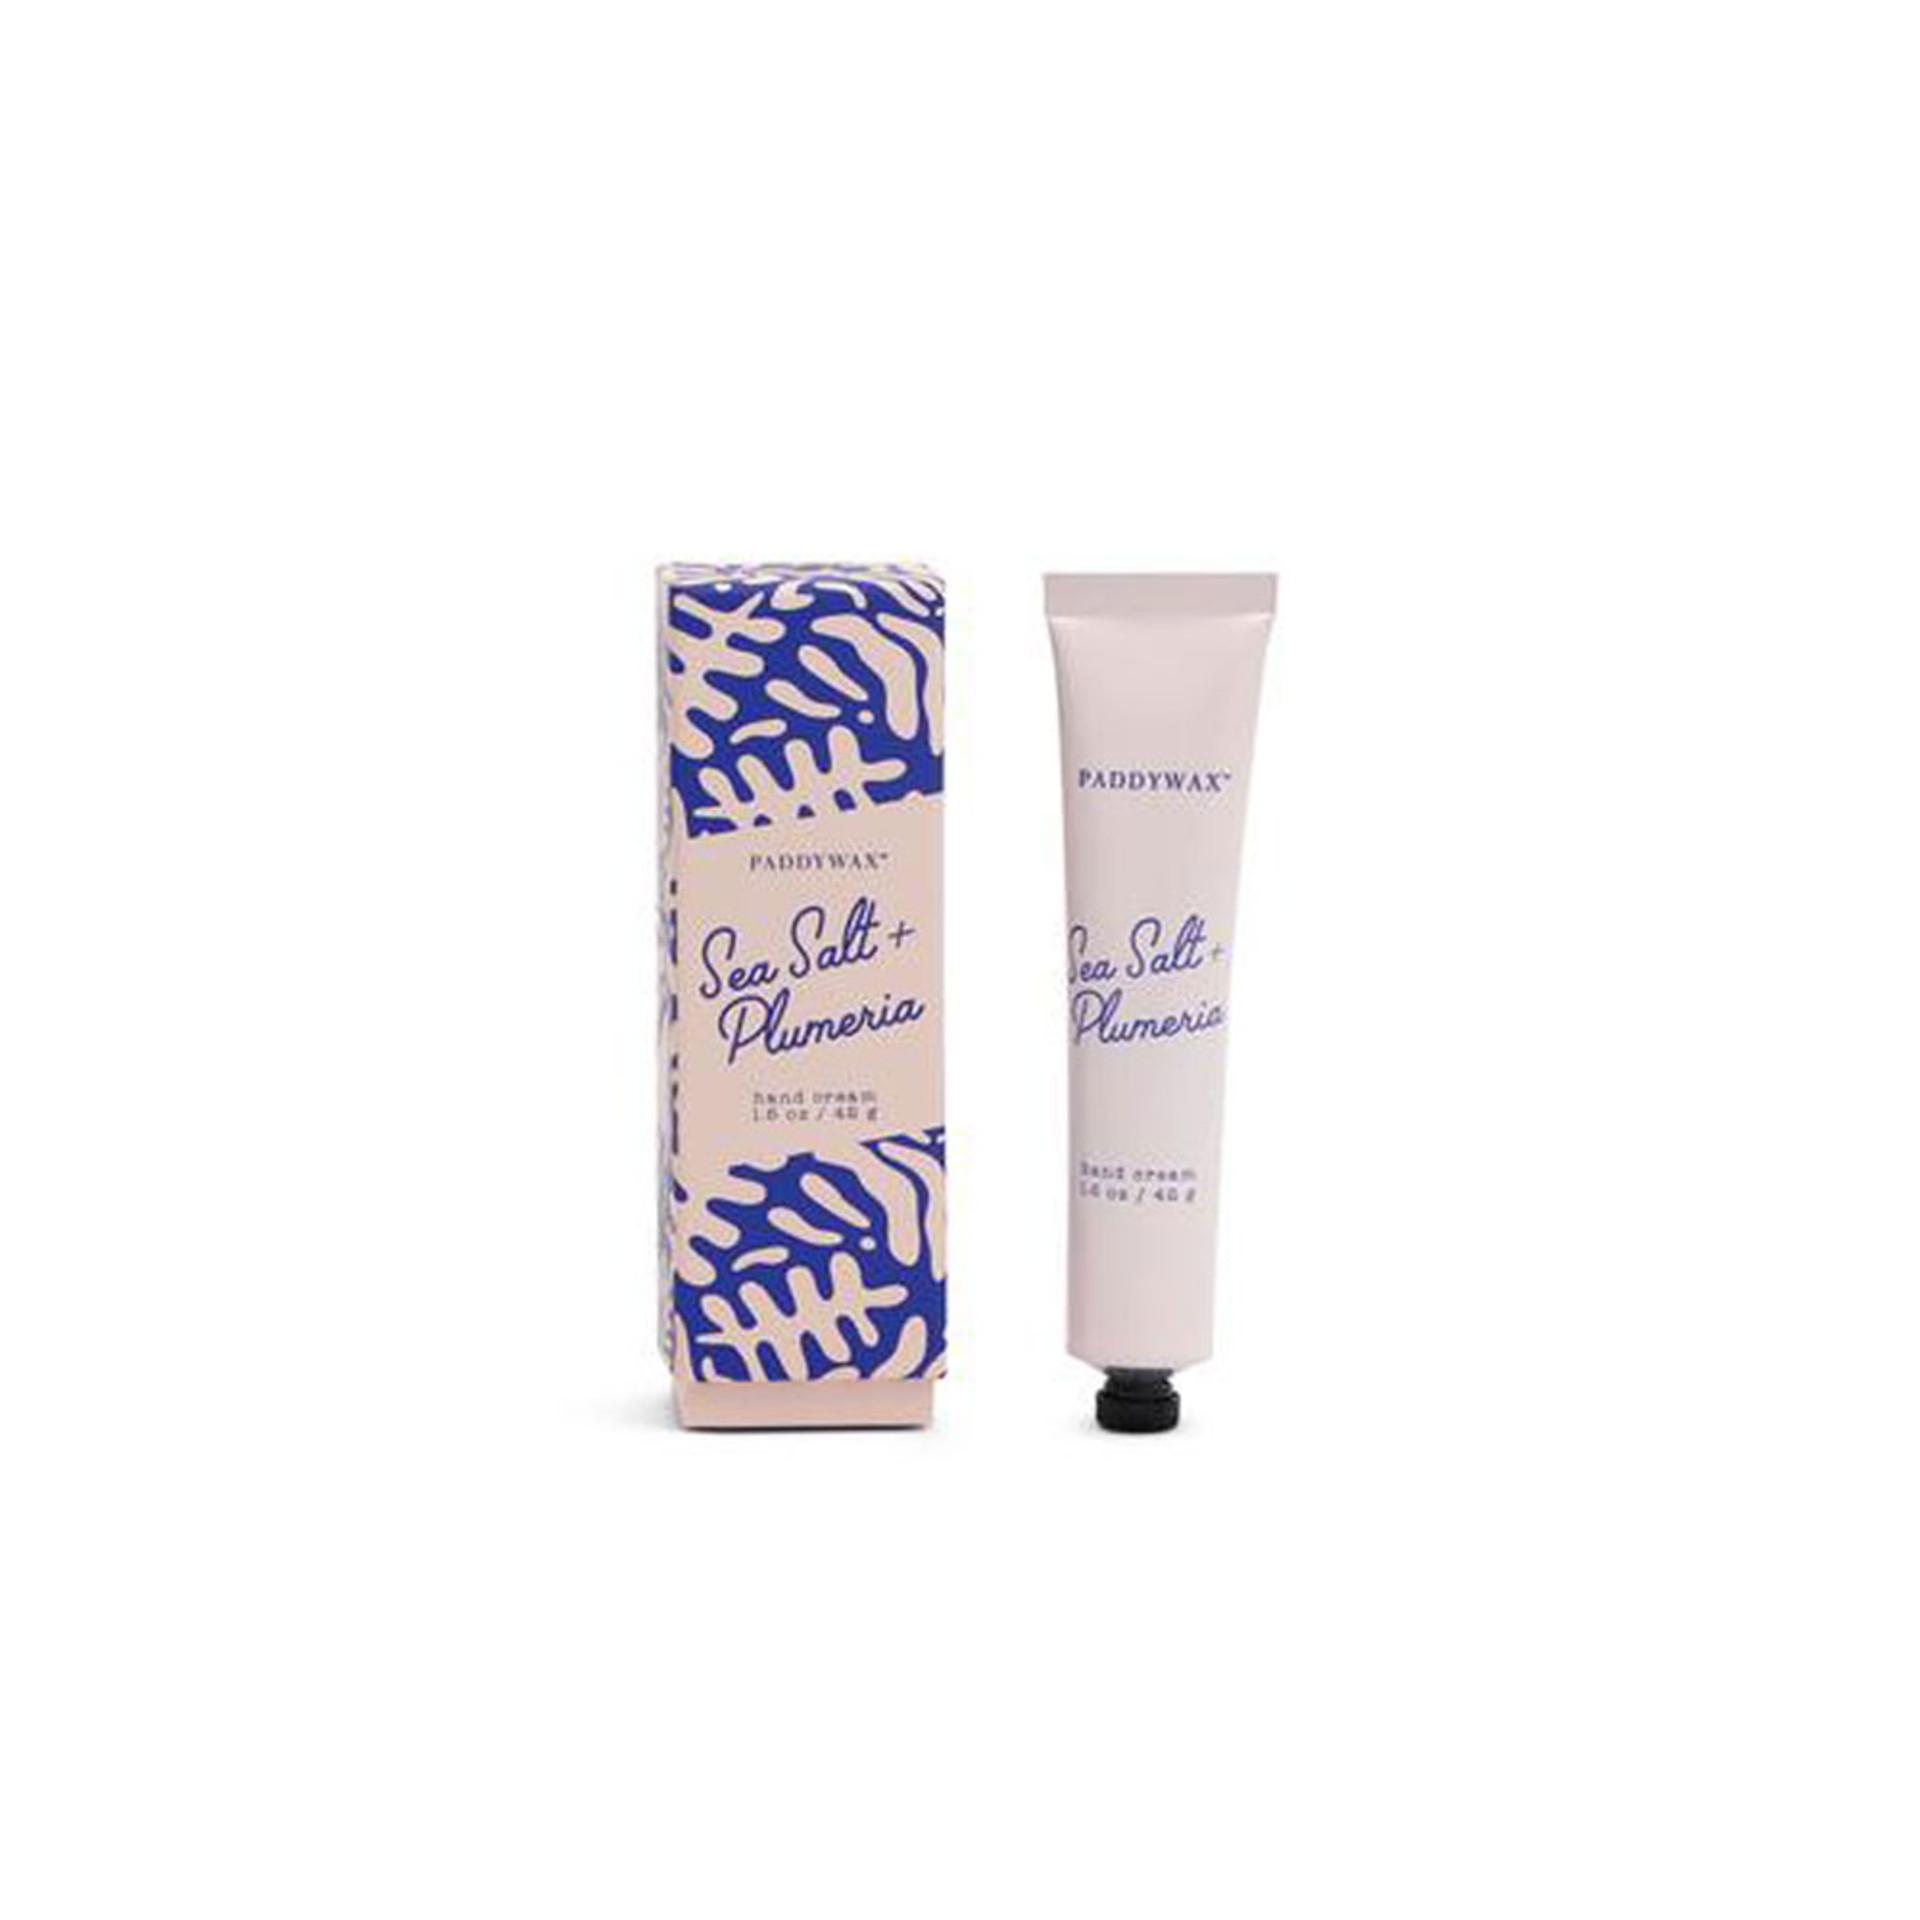 Paddywax Sea Salt Plumeria Hand Cream